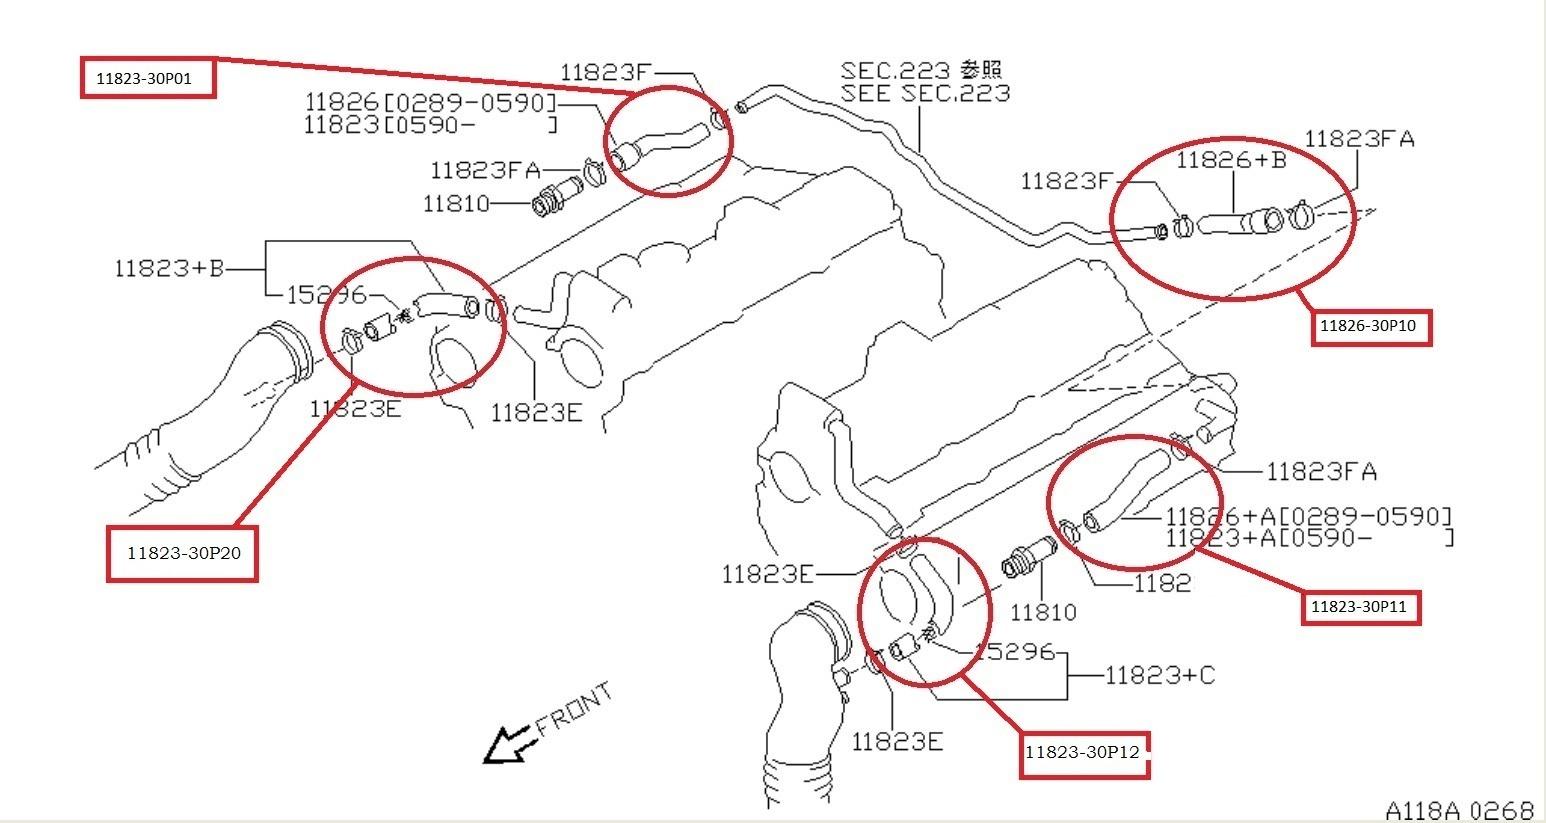 hight resolution of z32 tt vacuum diagram explained wiring diagrams 300zx tt vacuum diagram 300zx vacuum diagram na data